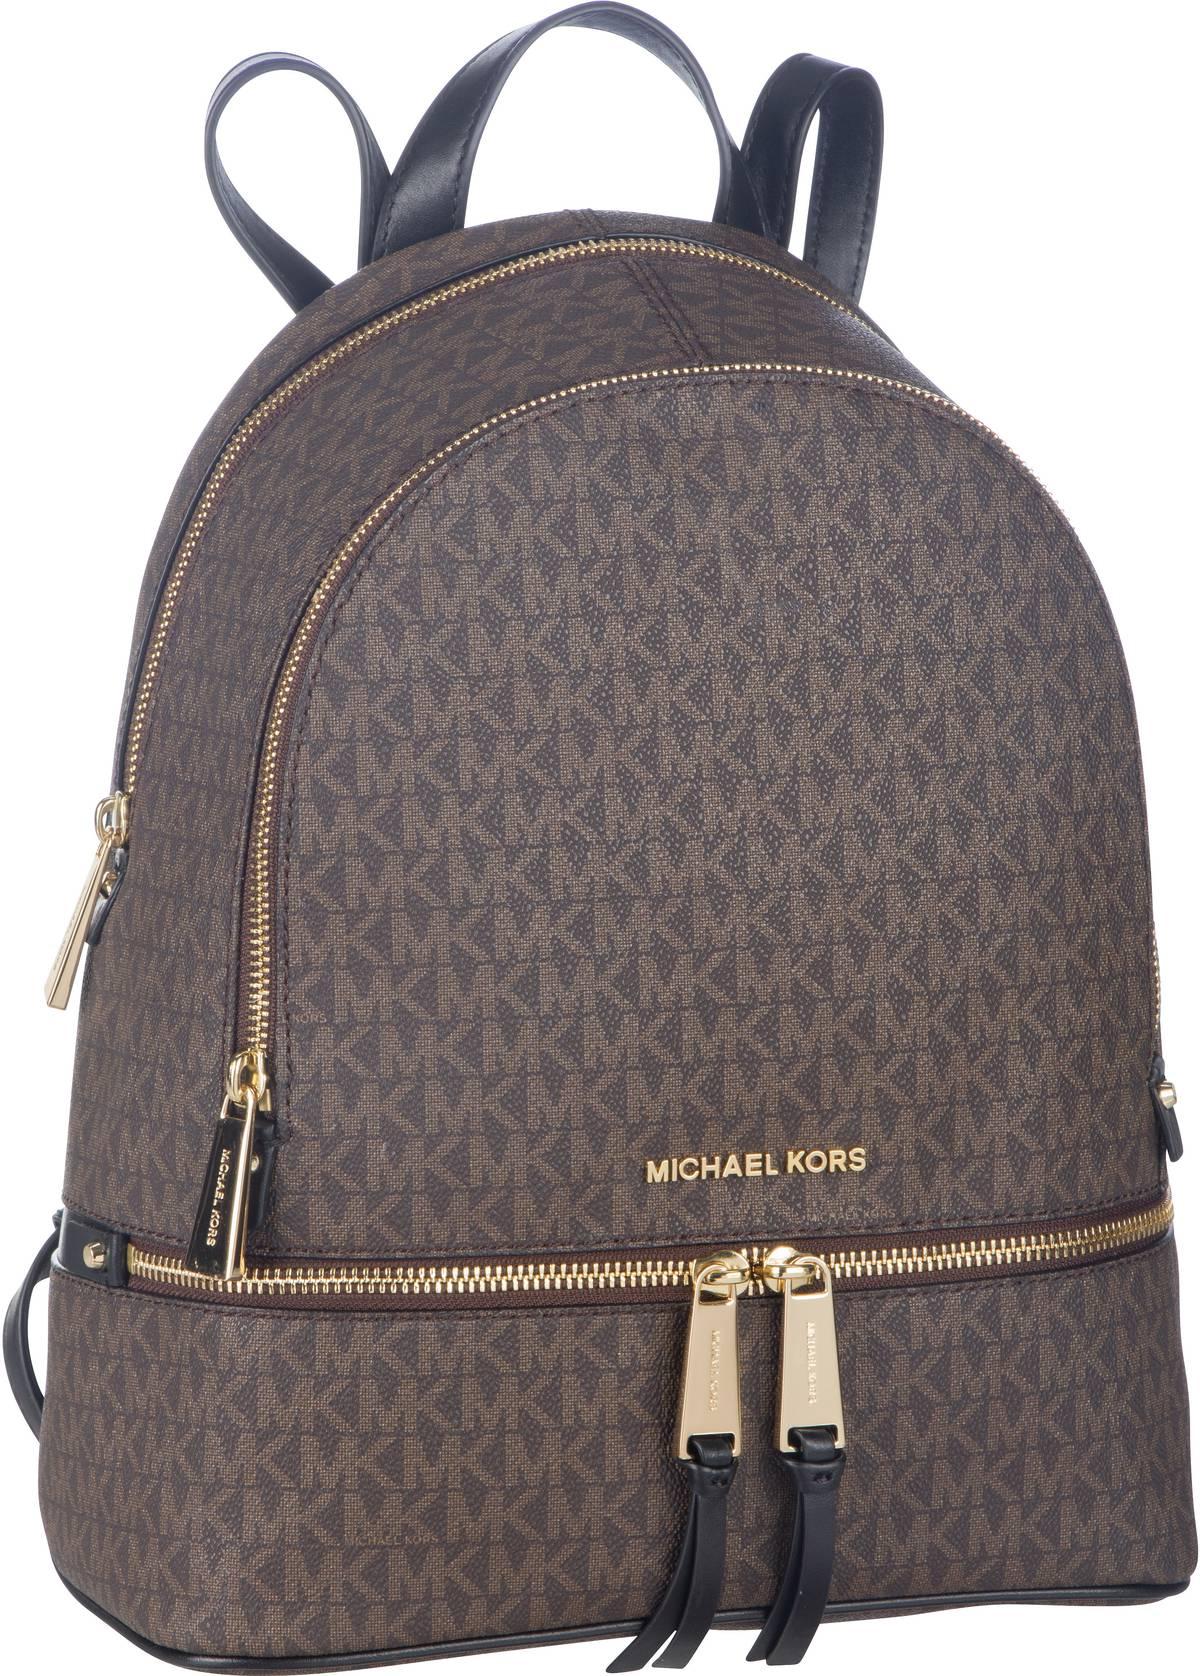 Rucksaecke - Michael Kors Rucksack Daypack Rhea Zip Medium Backpack MK Signature Brown Black  - Onlineshop Taschenkaufhaus